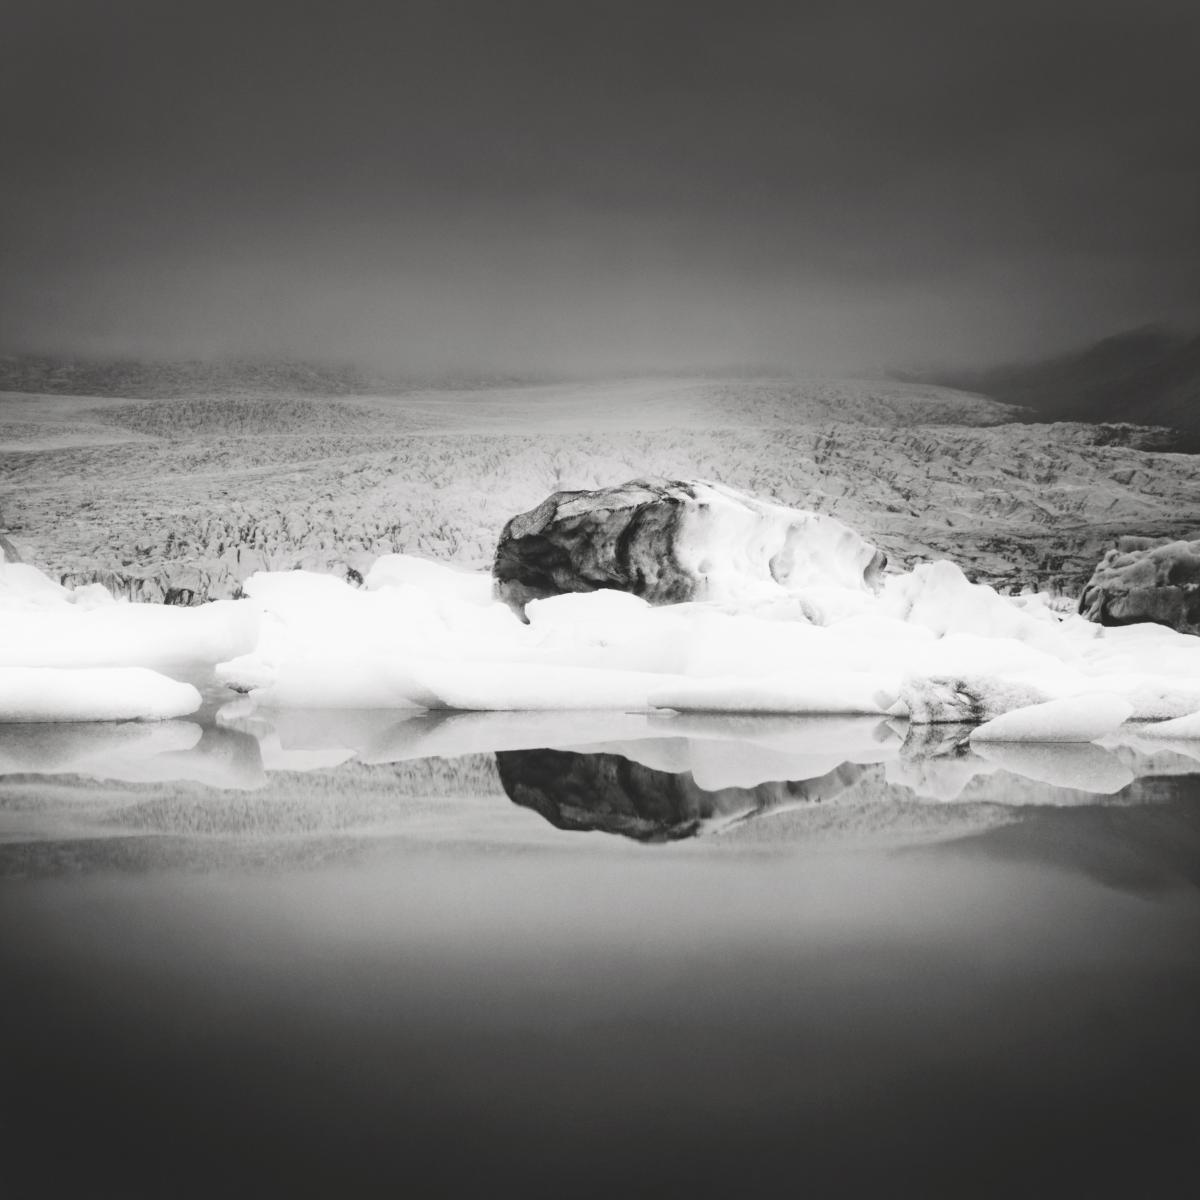 mostra fotografica Primitive Elements iceland